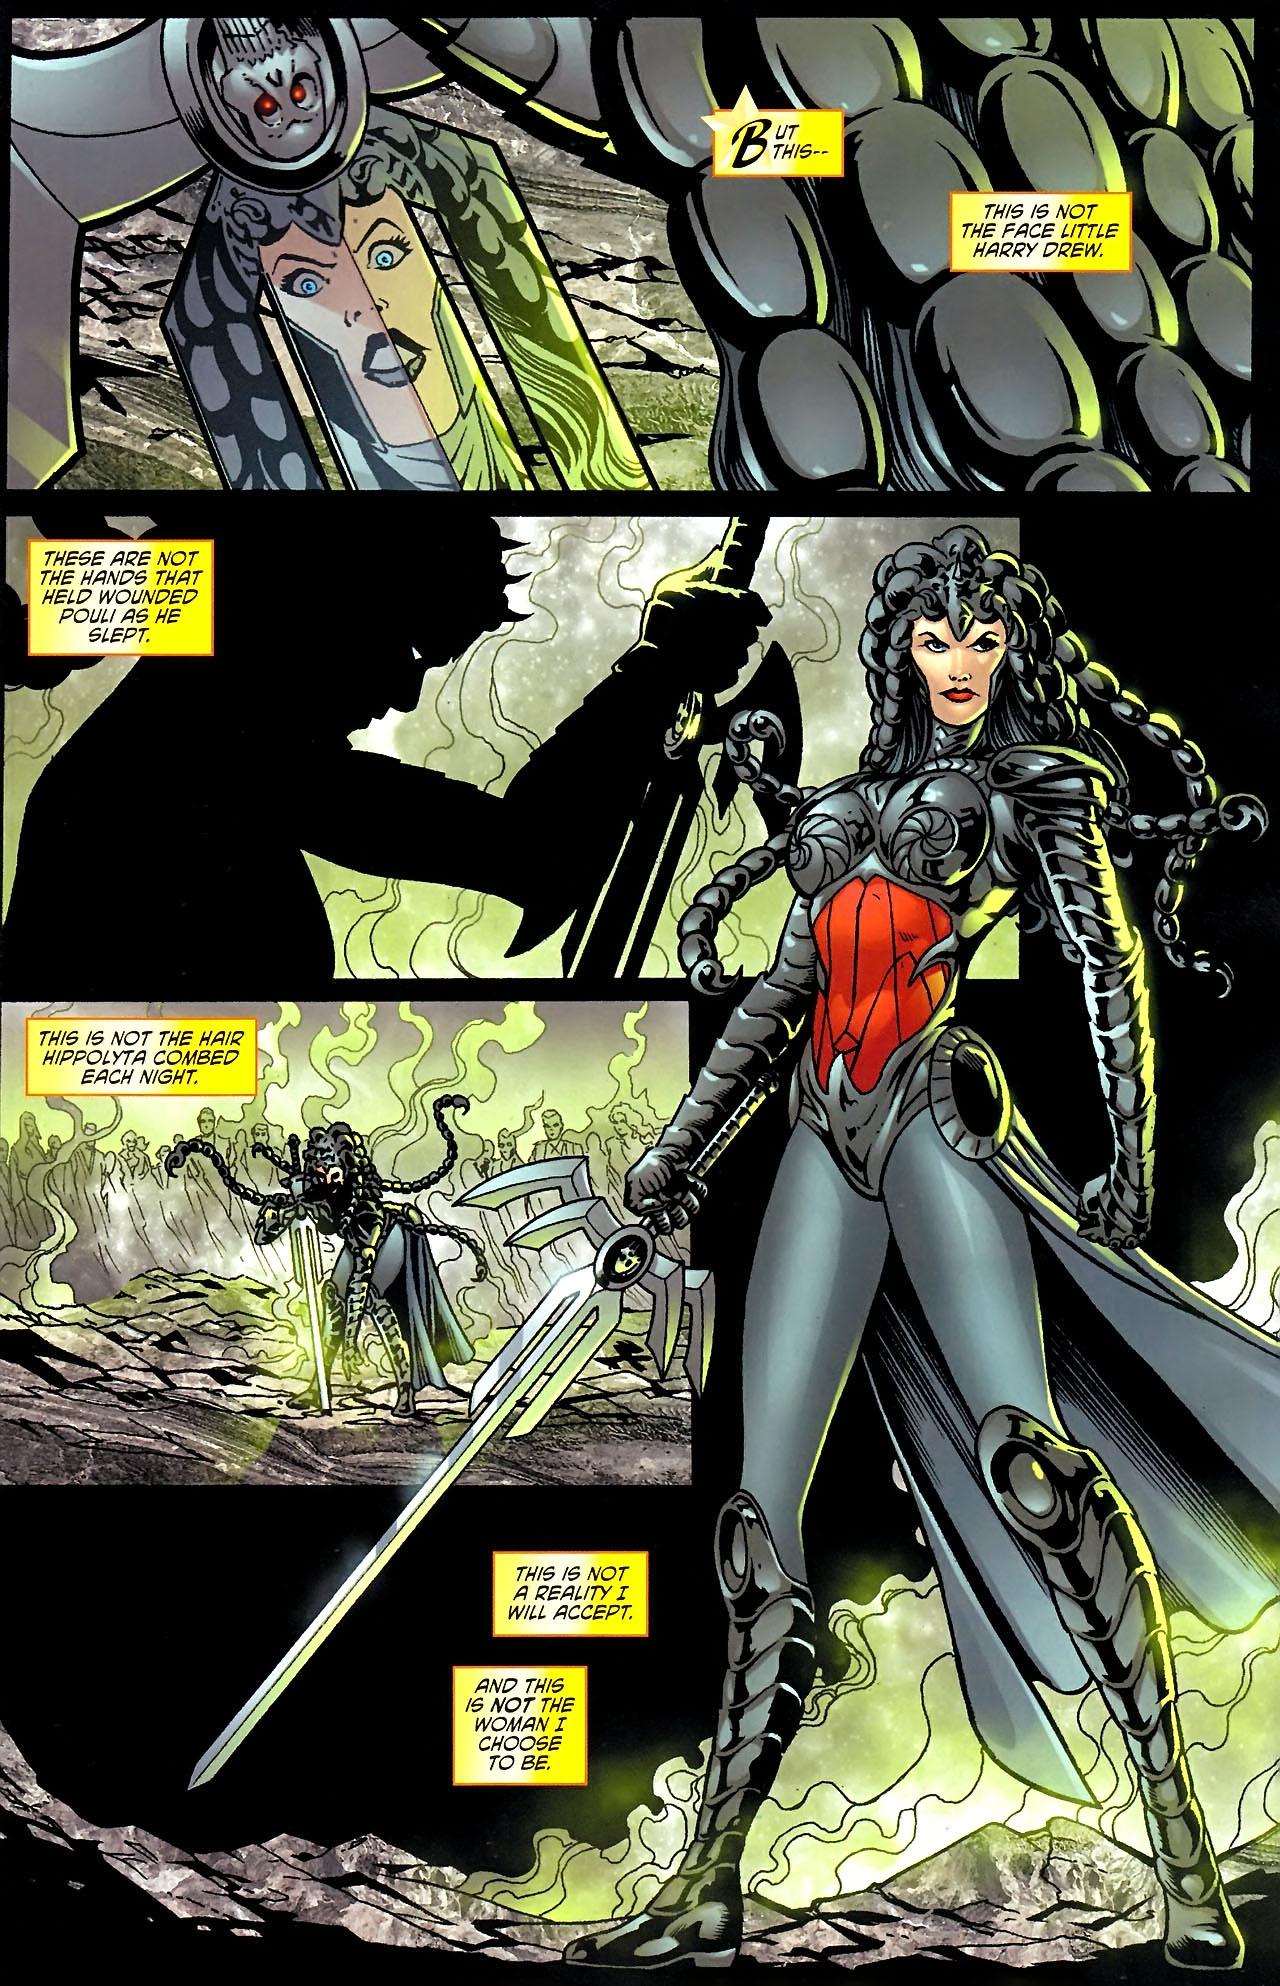 Read online Wonder Woman (2006) comic -  Issue #614 - 11